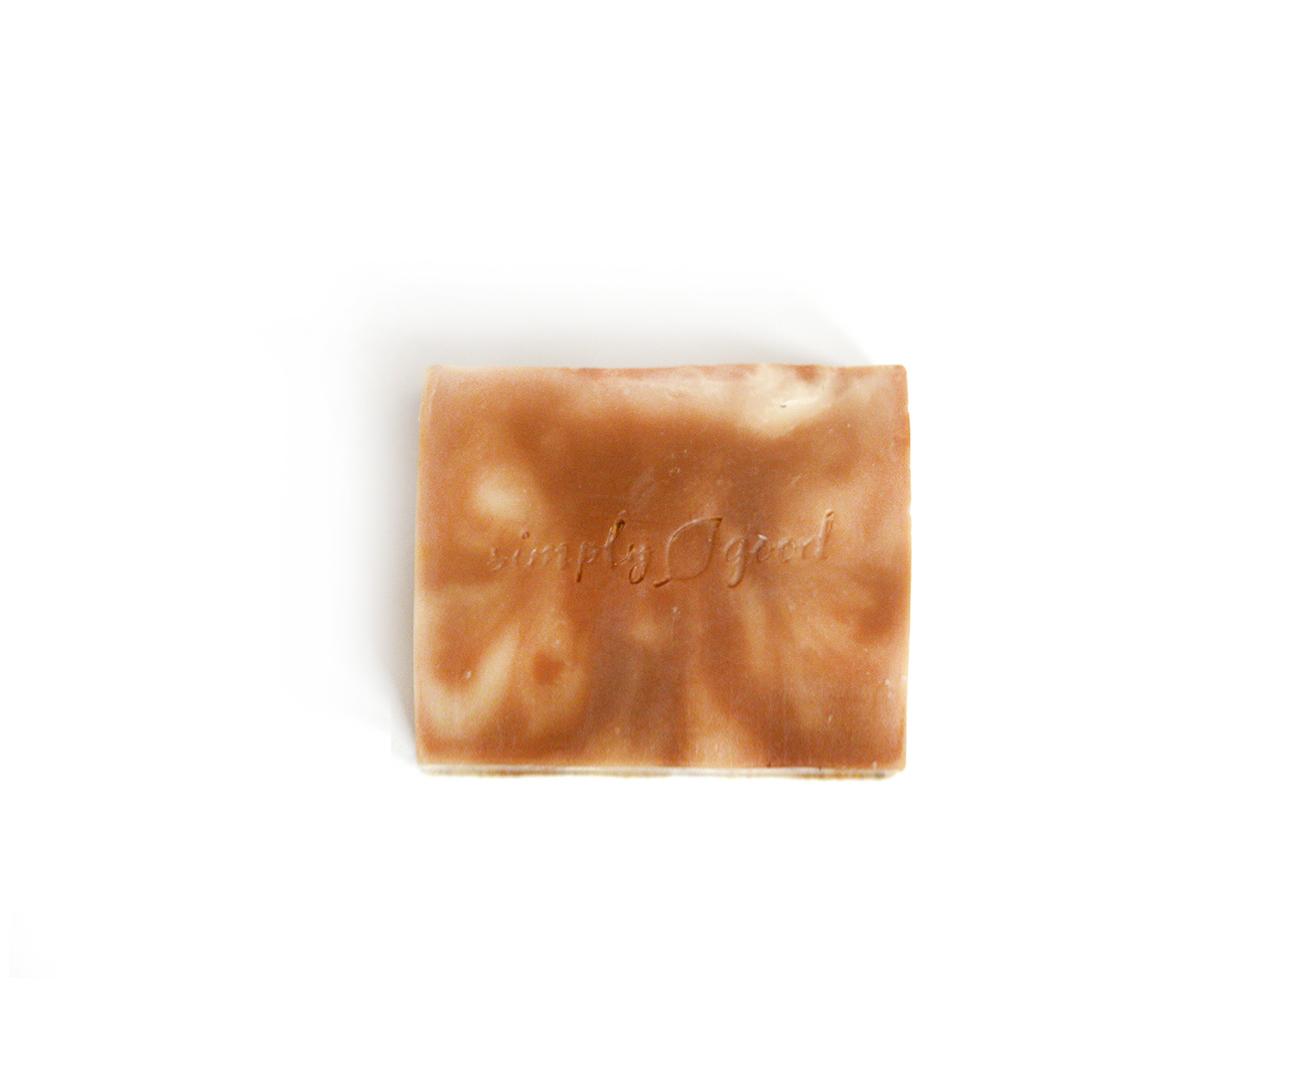 Egyptial Musk Simply Good™ Triple Butter Vegan Soap Bar 00550